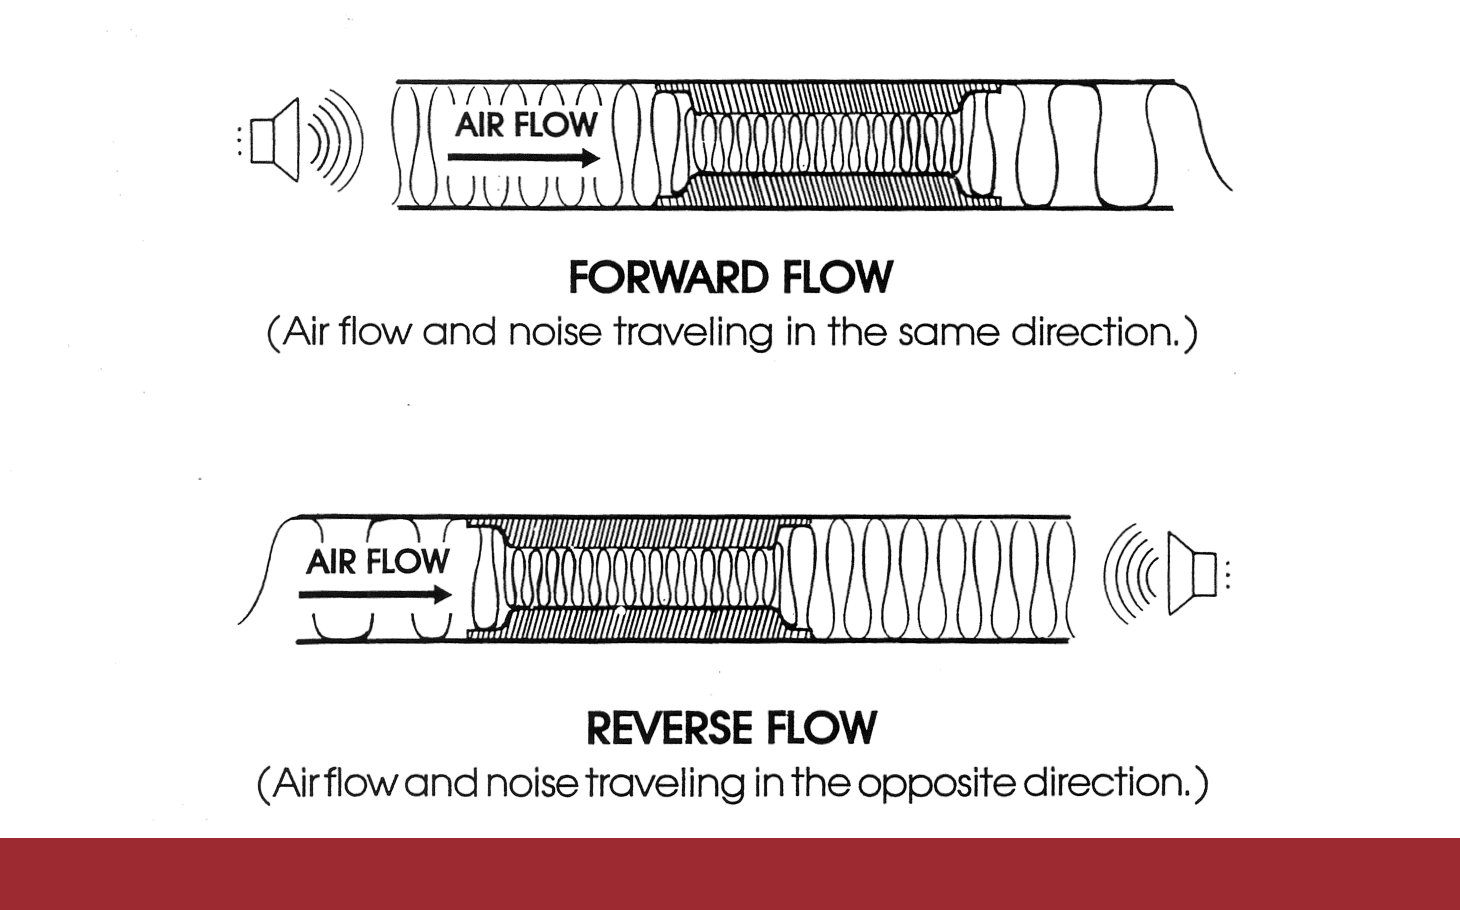 MF forward flow and reverse flow drawings